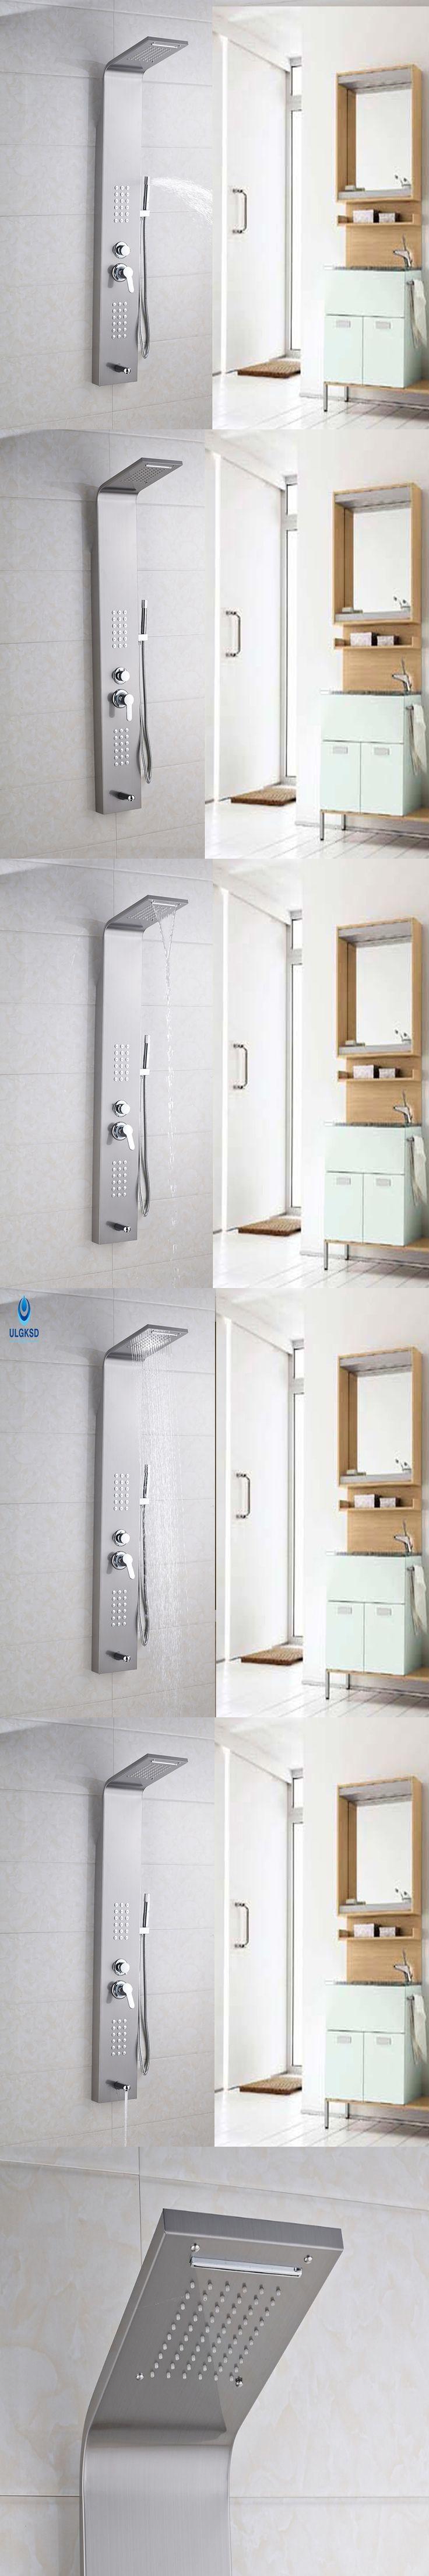 Ulgksd Stainless steel Shower Column Bathroom Shower Panel Handle BathTub Faucet Spout Mixer W/ Hand Shower Faucet Massage Jets